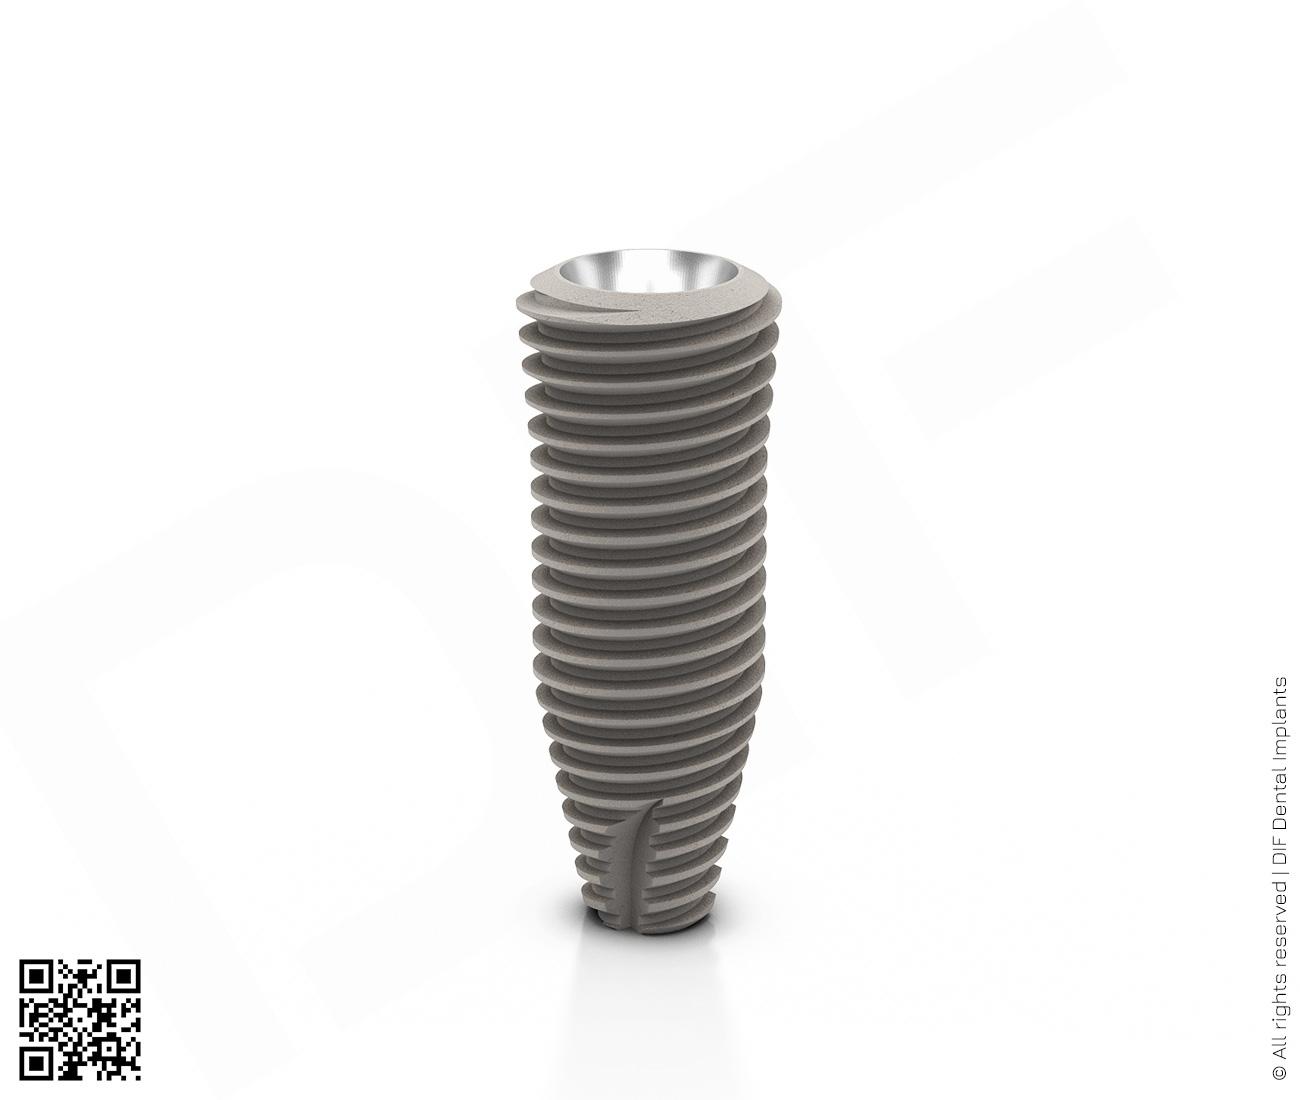 Фото имплантат mainstream fine d5.0 мм – l13.0 мм  производства DIF.